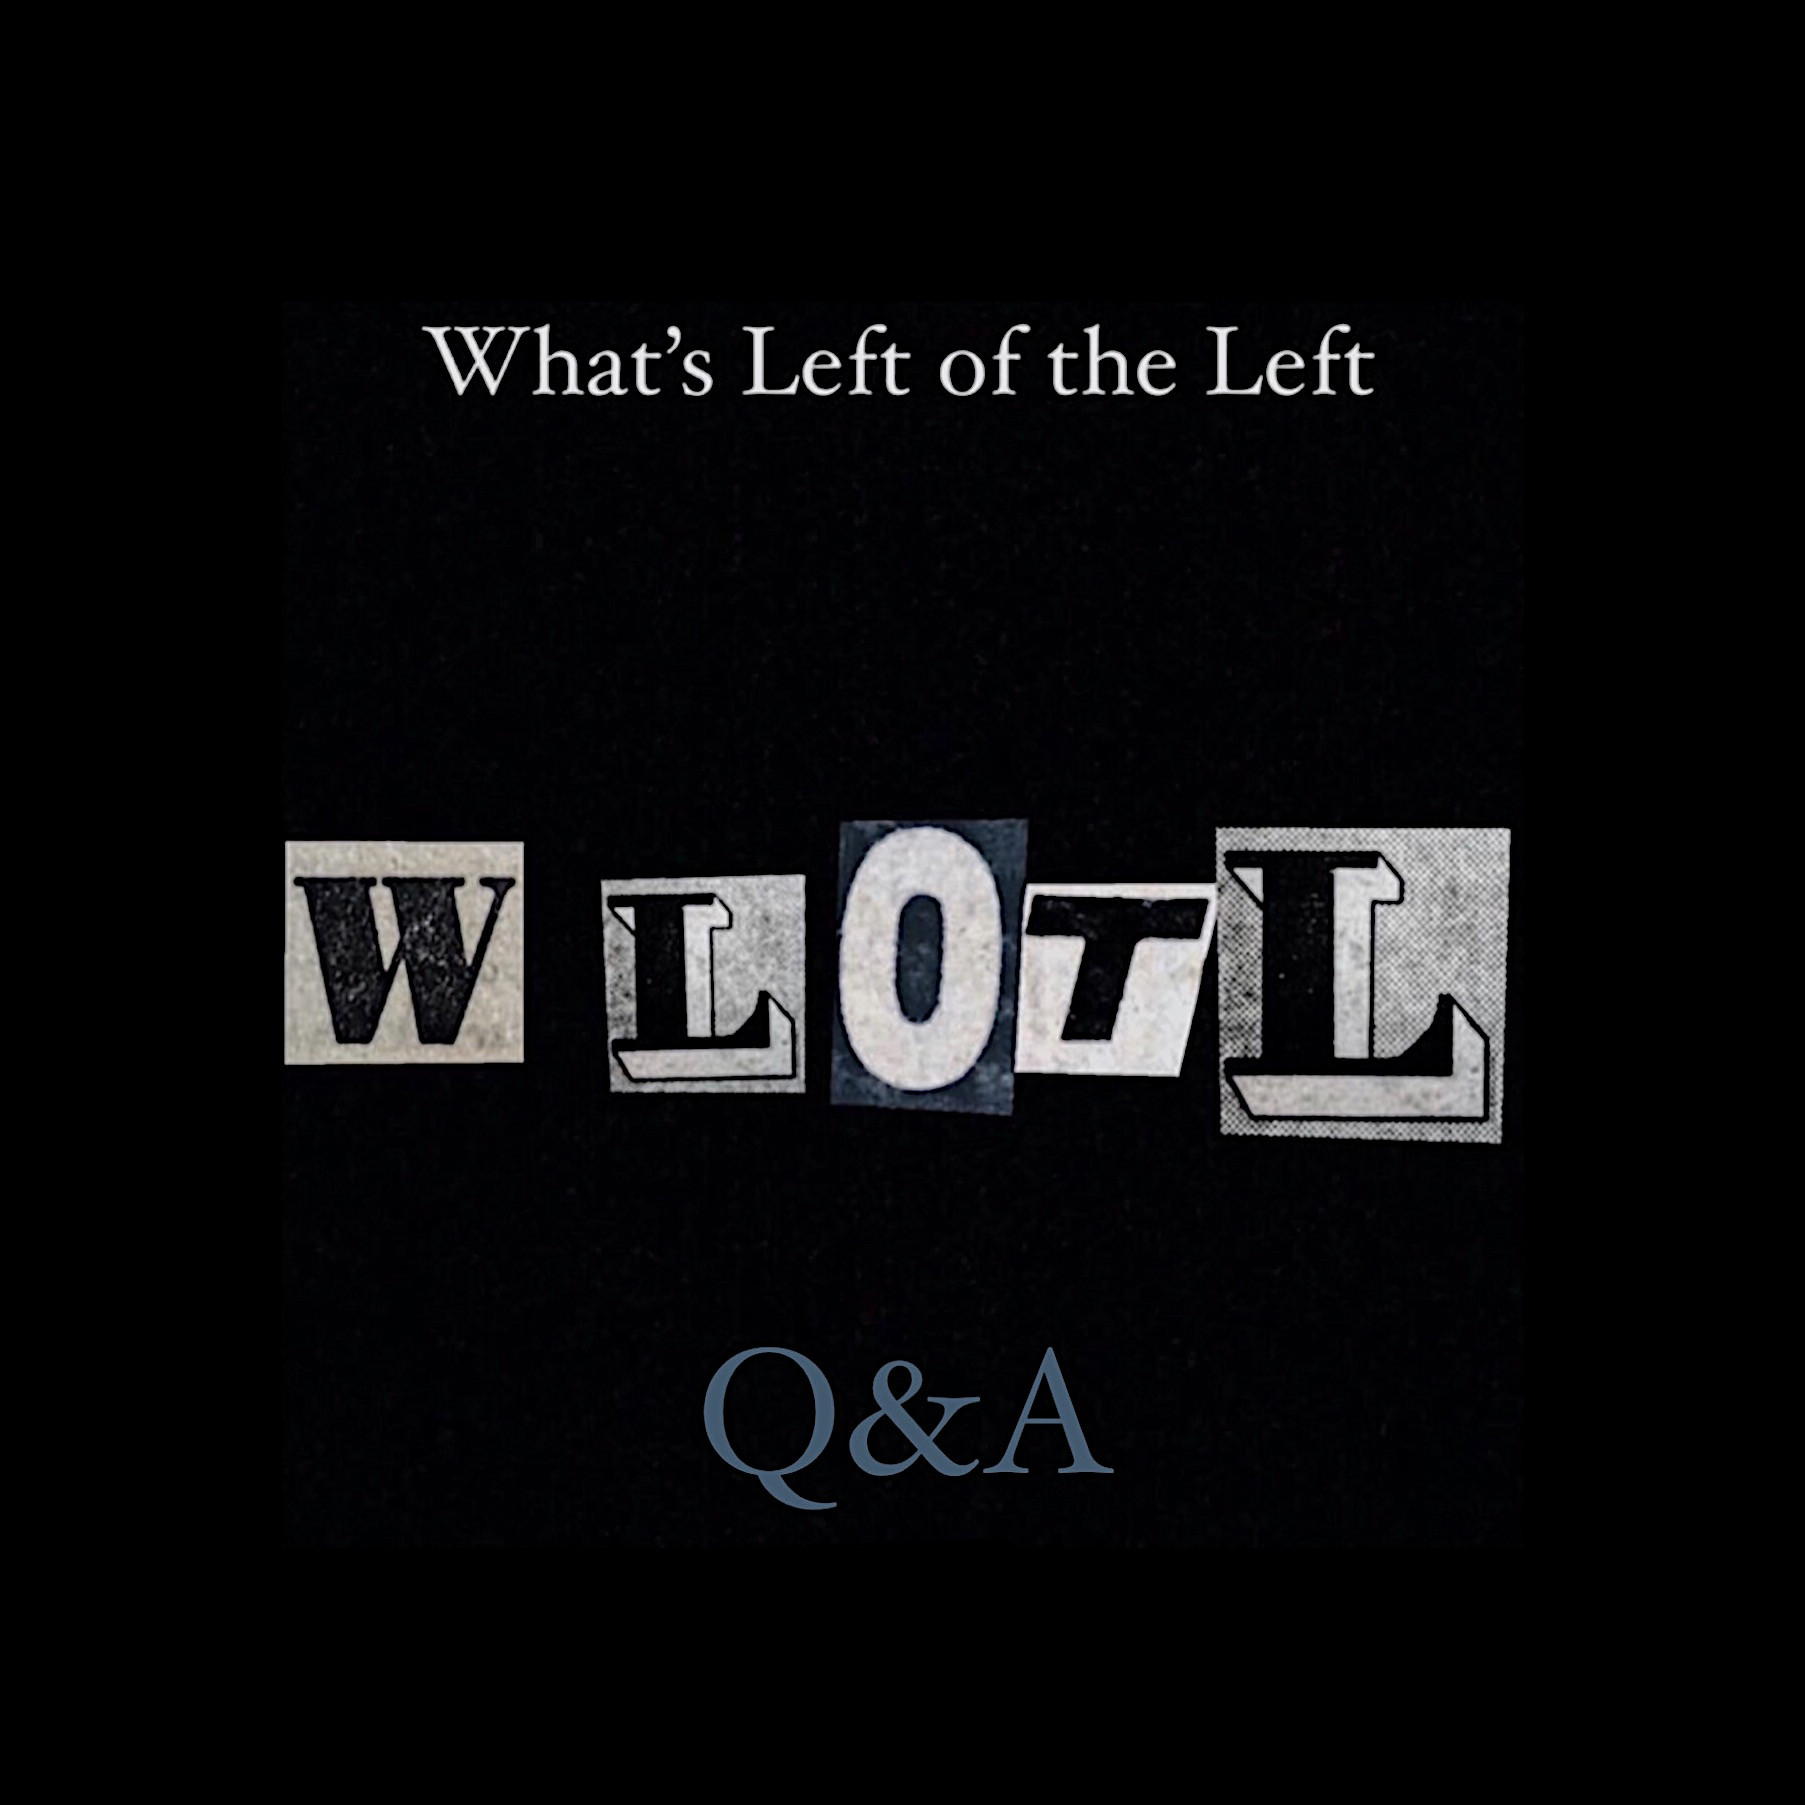 EP 4: Q&A